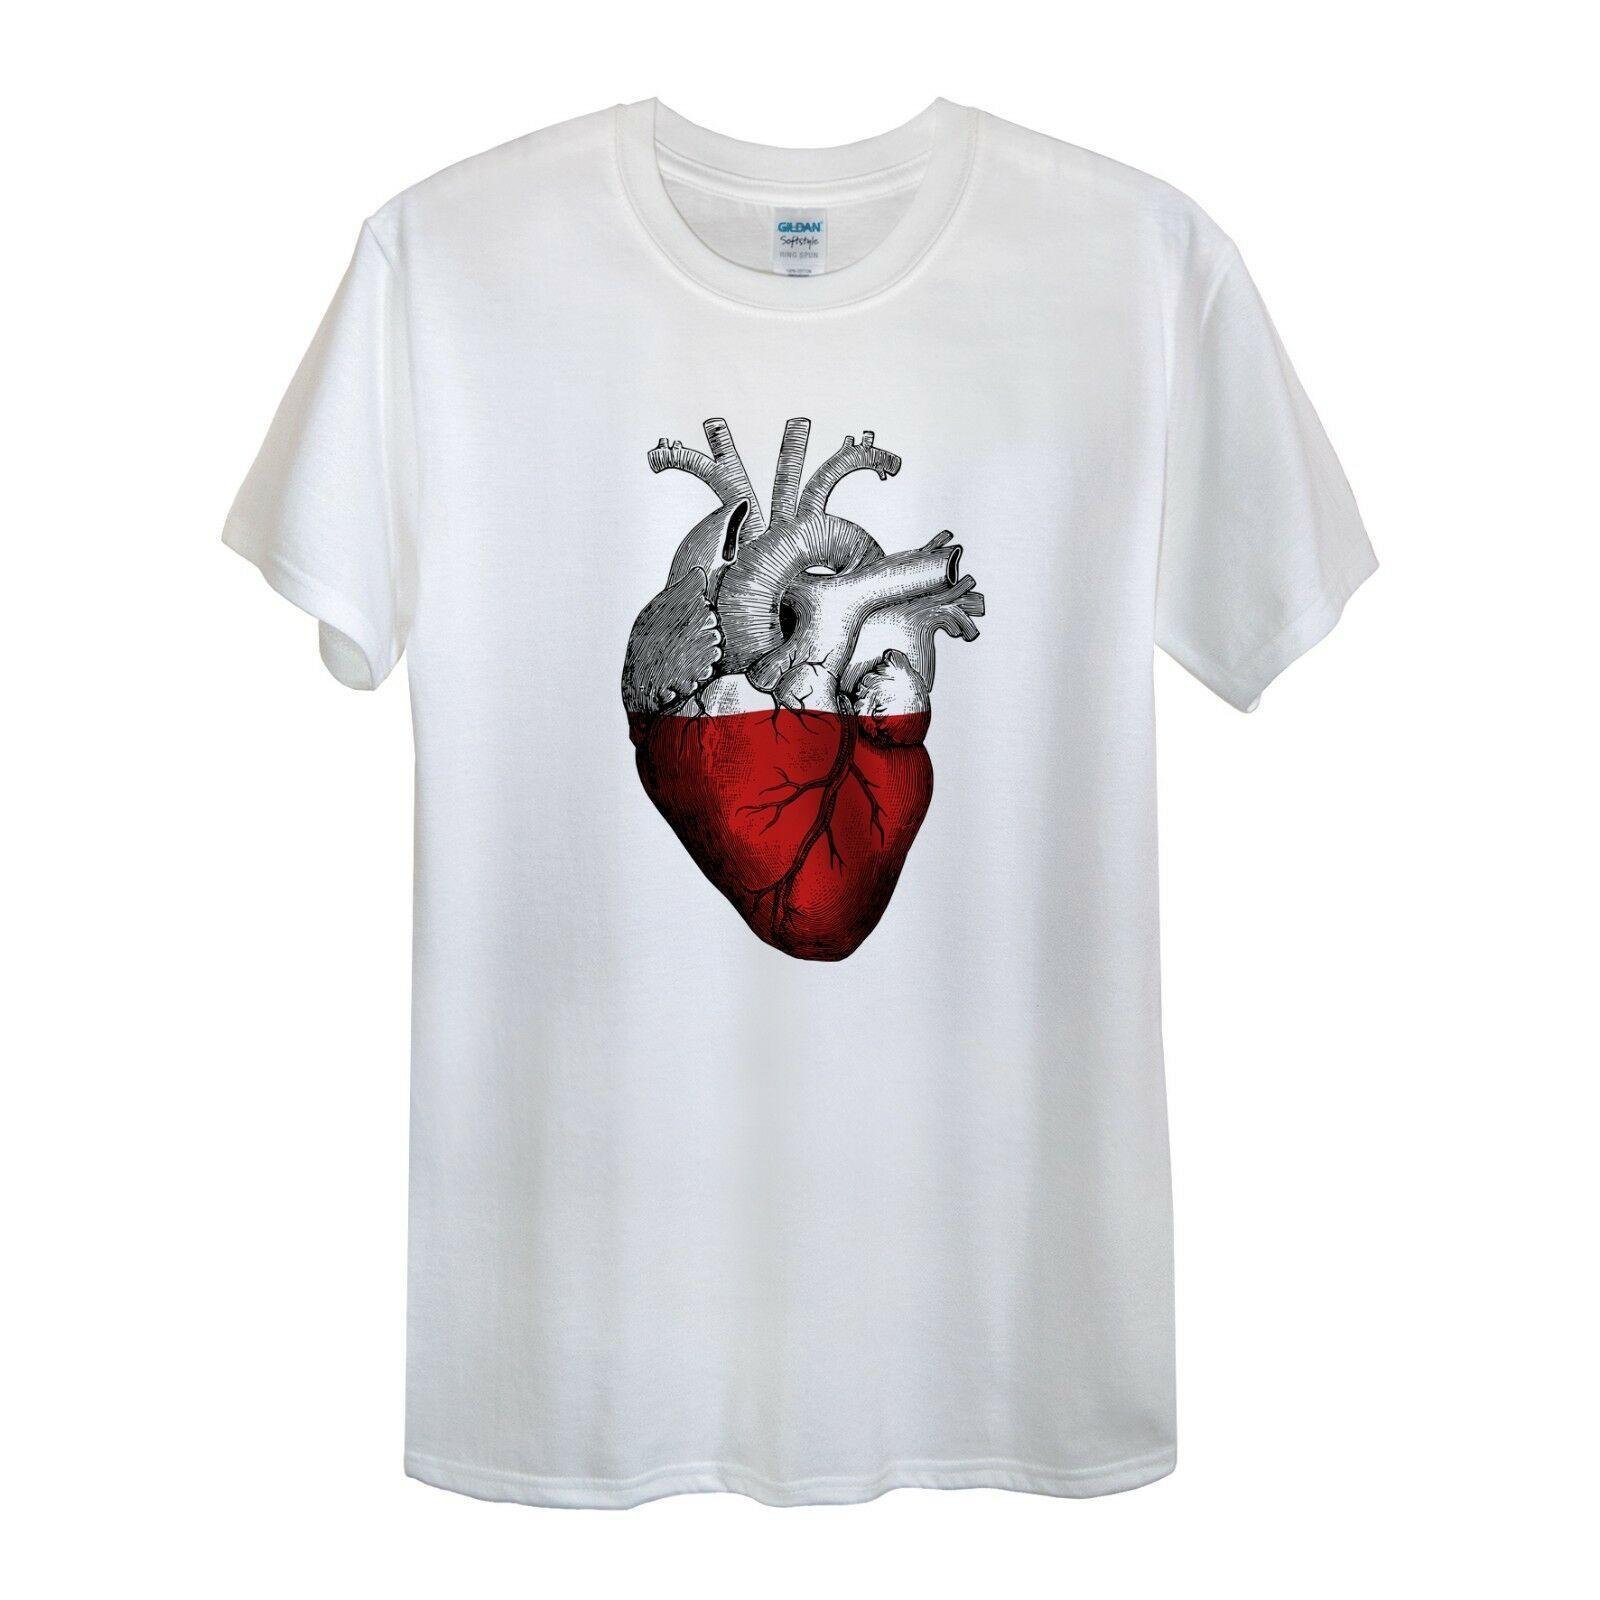 856cb4286 Poland T Shirt Men Women Unisex Love Heart National Polish Polska Gift  ShirtFunny Unisex Casual Top With T Shirt T Shirts Shopping From Dragontee,  ...